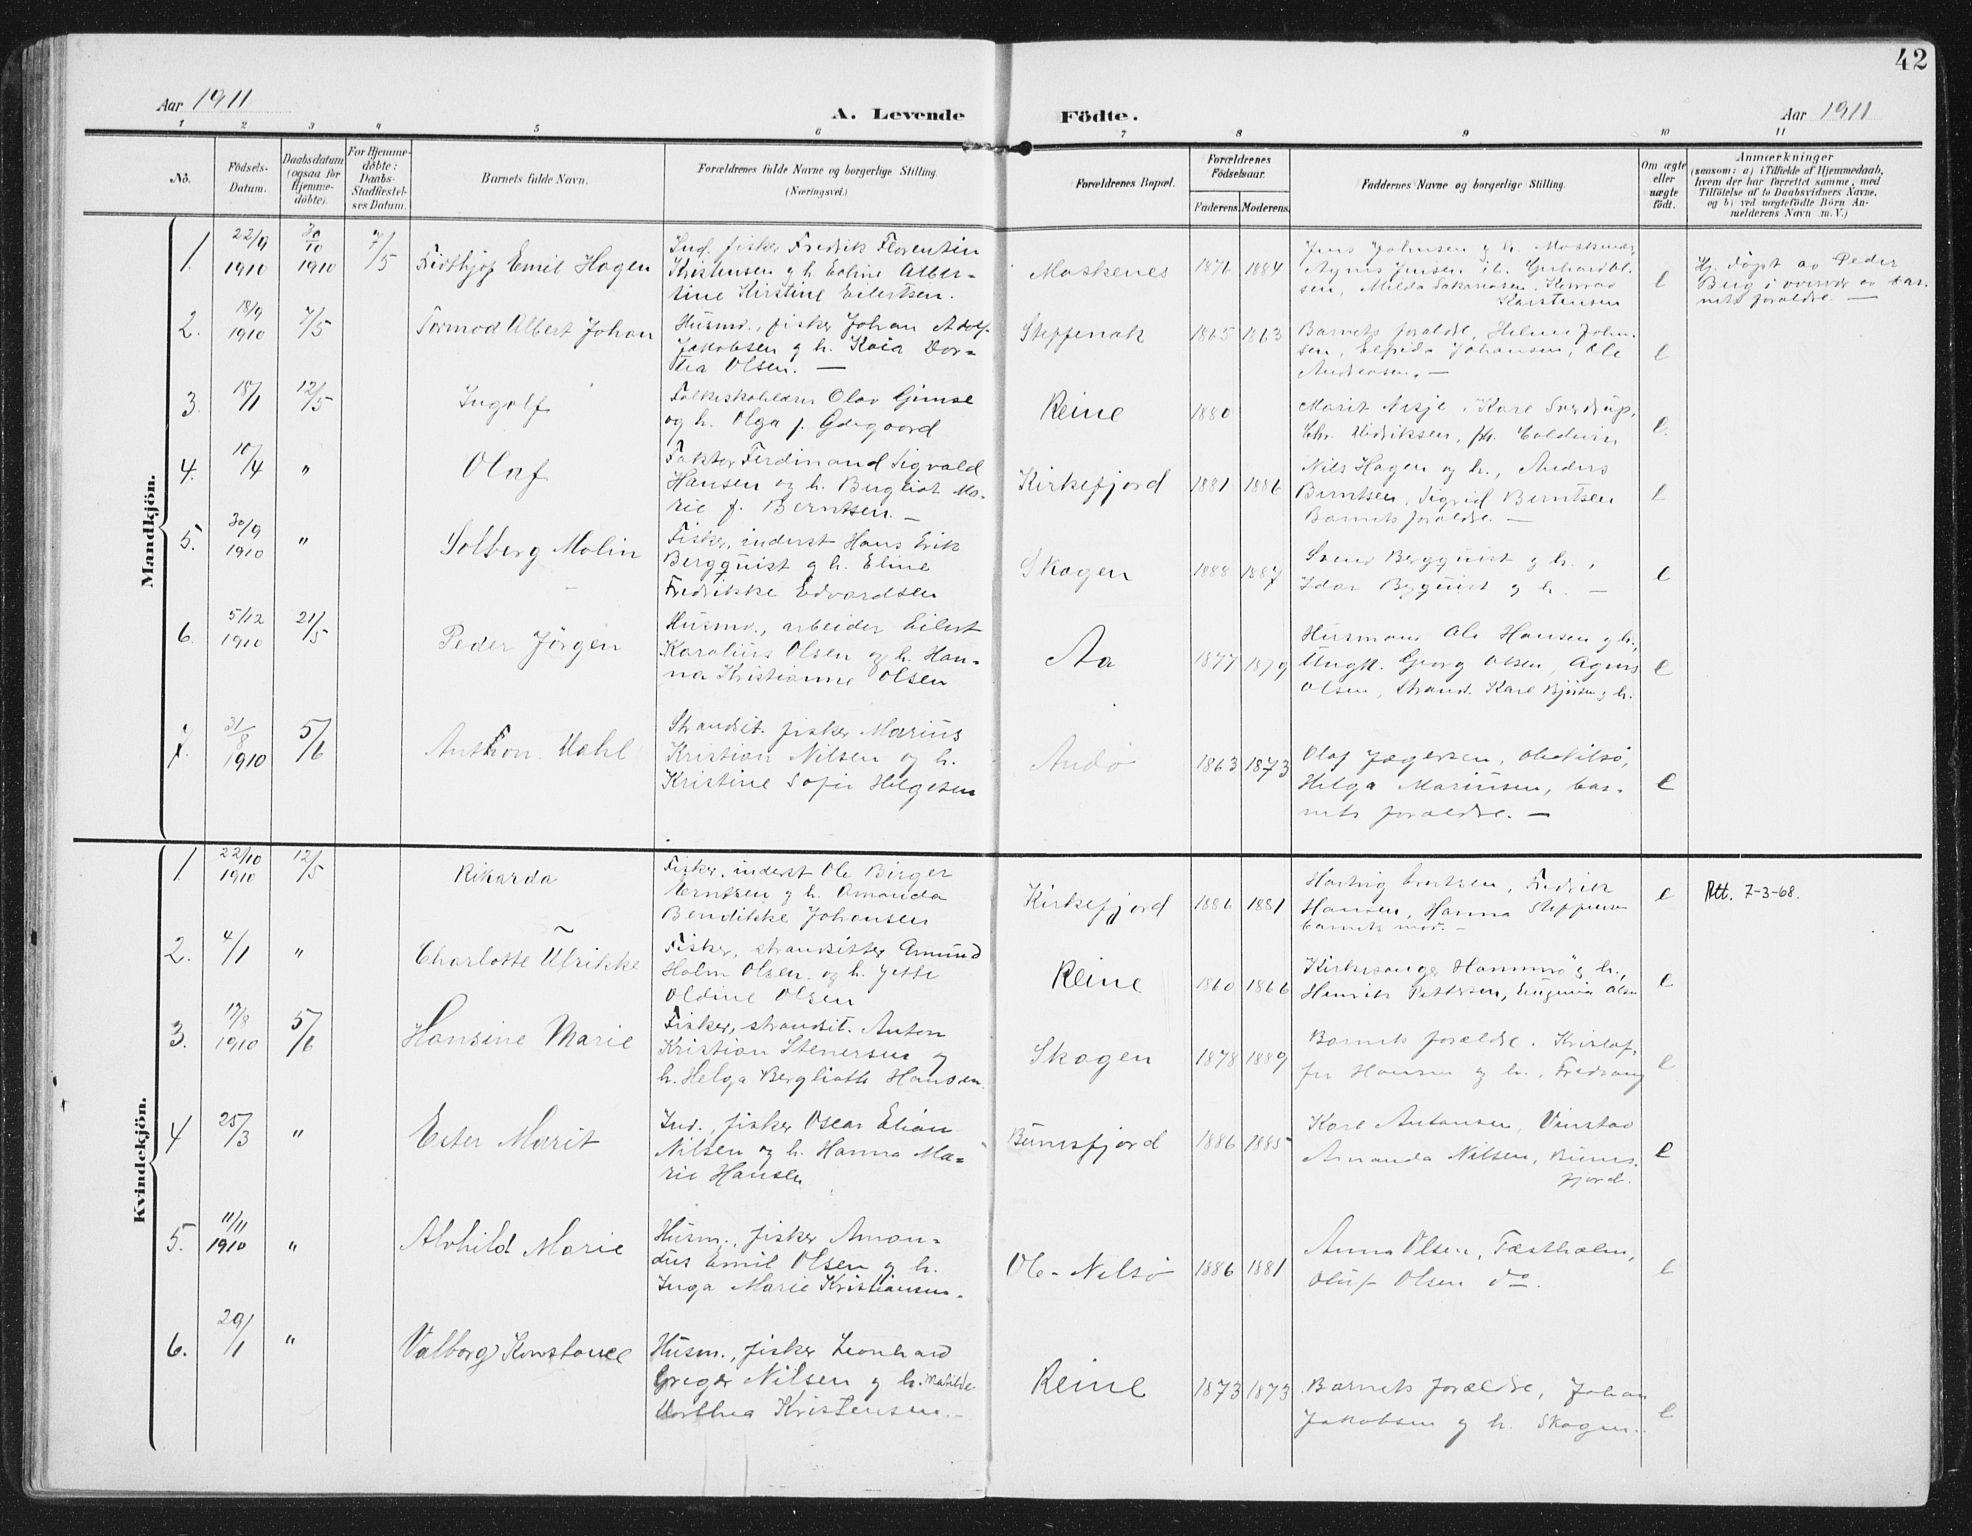 SAT, Ministerialprotokoller, klokkerbøker og fødselsregistre - Nordland, 886/L1221: Ministerialbok nr. 886A03, 1903-1913, s. 42